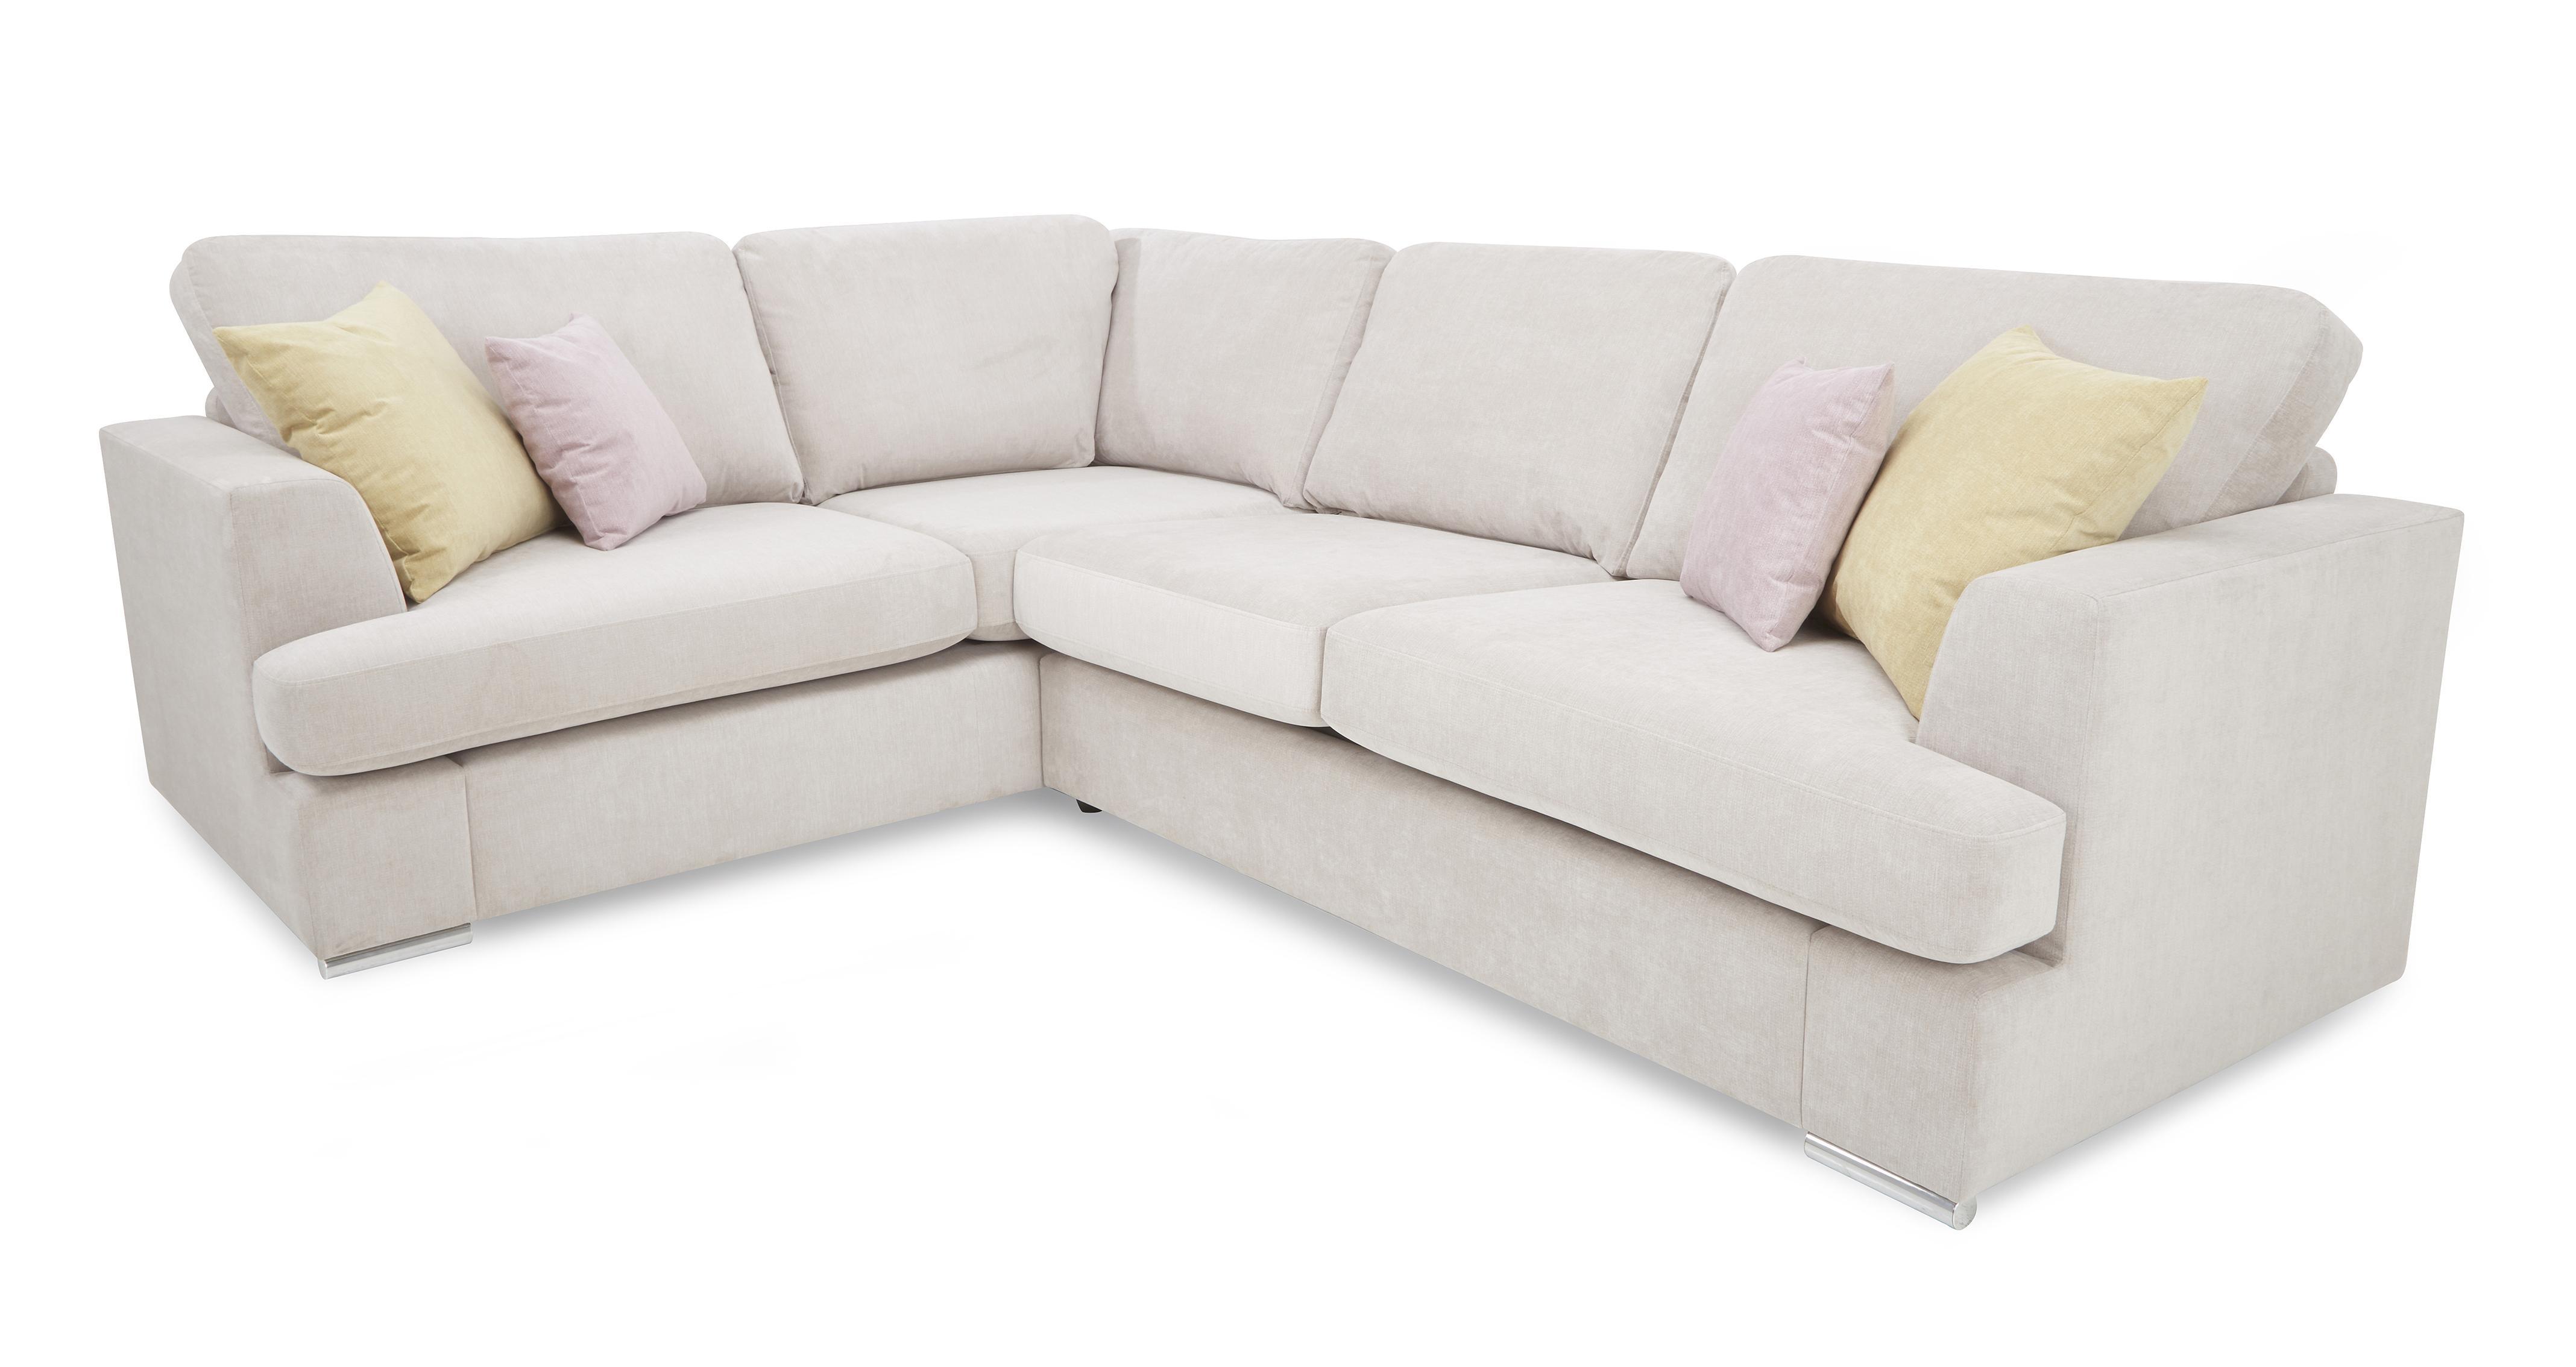 Enjoyable Freya Right Hand Facing 2 Piece Corner Sofa Dfs Spain Machost Co Dining Chair Design Ideas Machostcouk